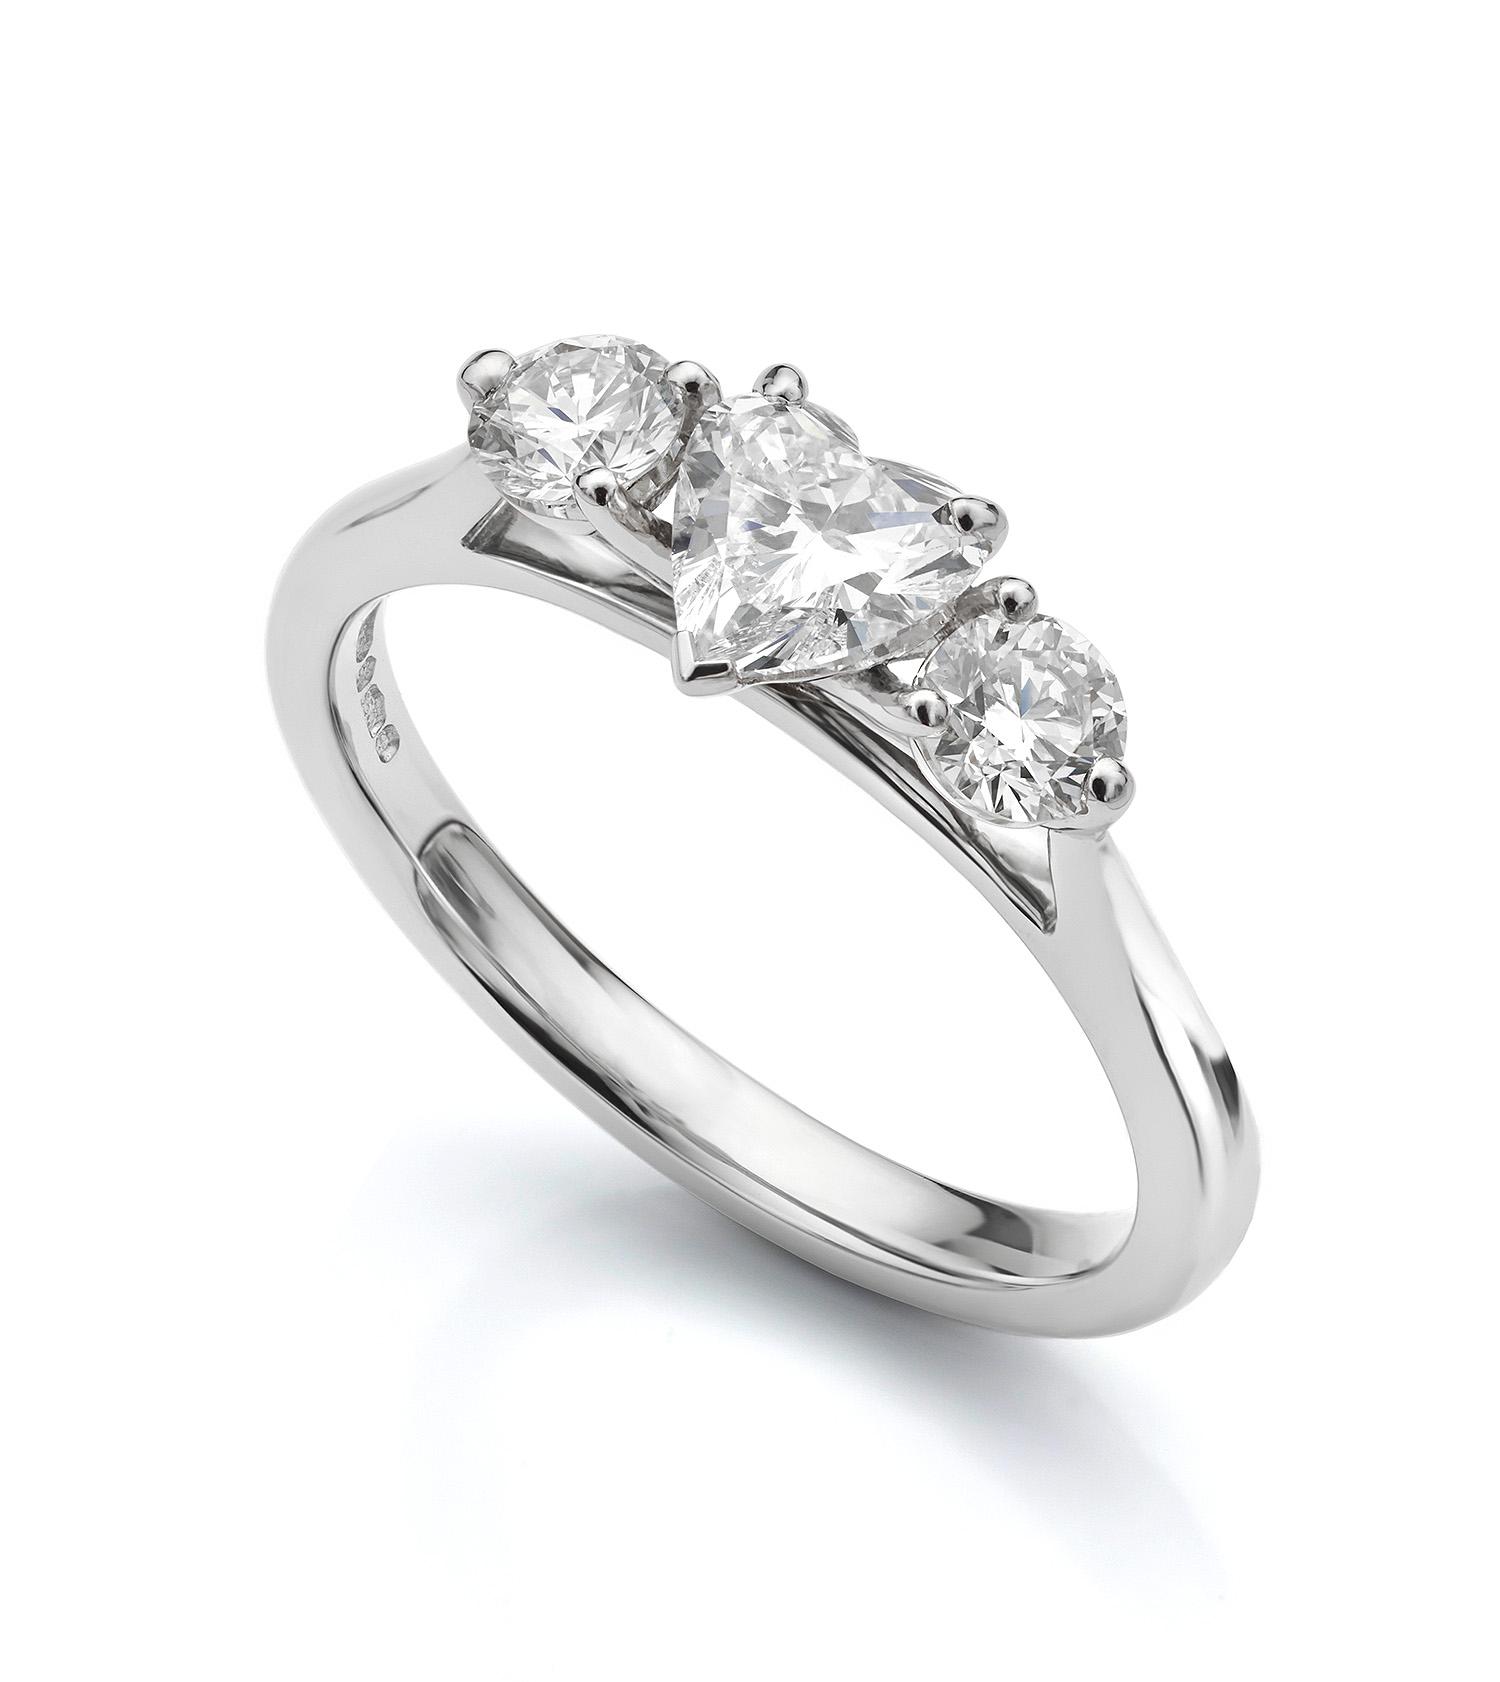 Heart shaped diamond trilogy ring